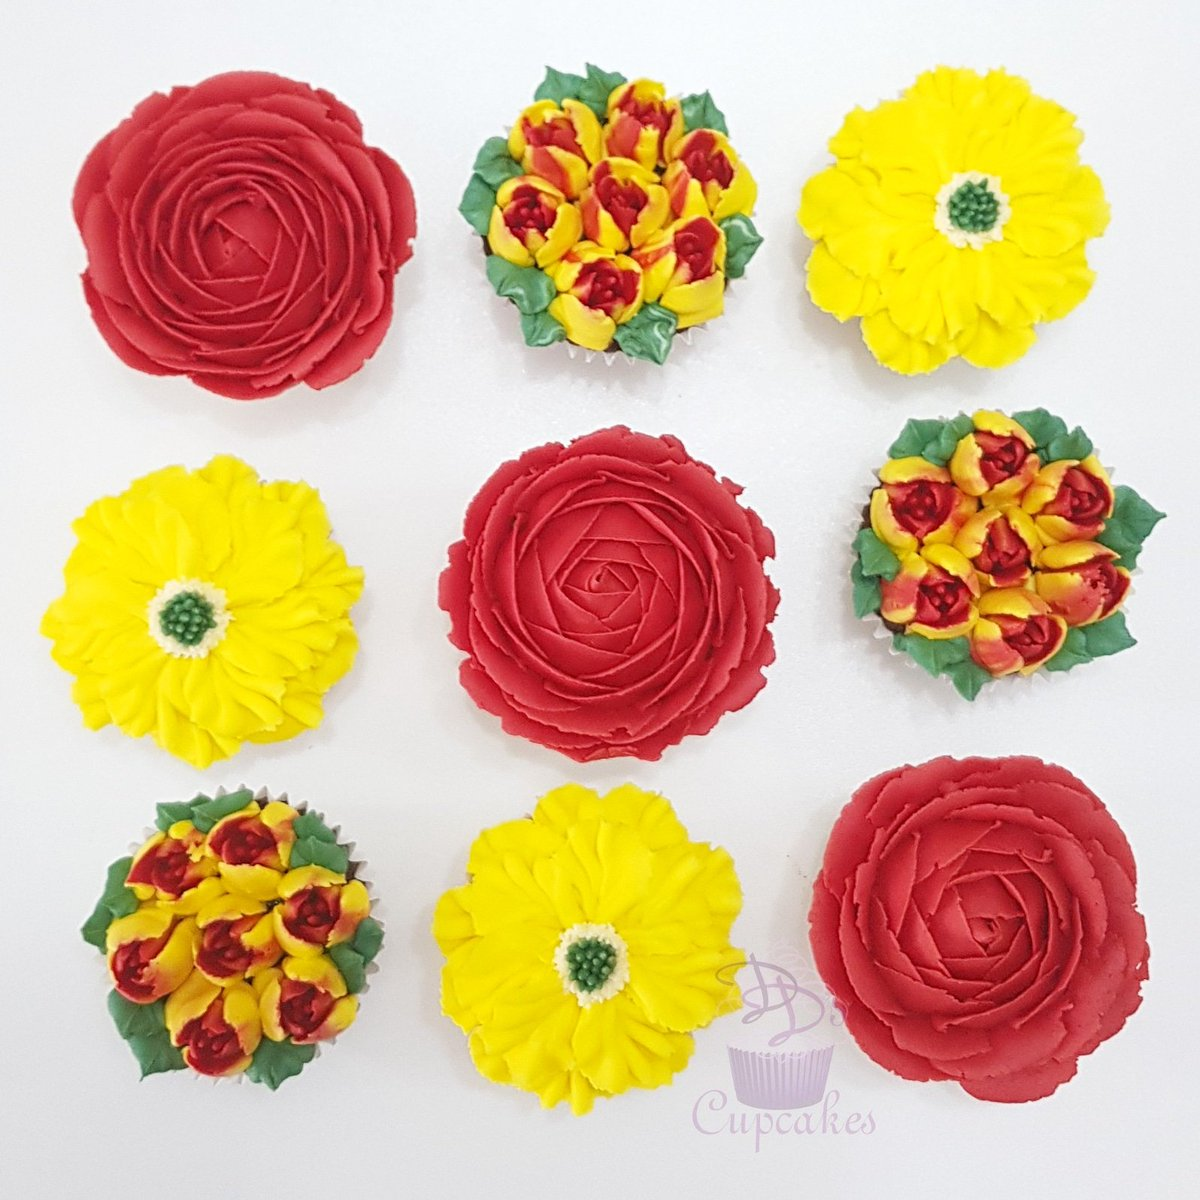 Buttercream flowers - Scabiosa, Roses & Tulips http://www.dds-cupcakes.com   #sbs #queenof #BoostTorbay #devonfood #buttercreamart #smartsocial #buttercreamflowers #artisanbaker #ddscupcakes #cupcakespic.twitter.com/RAKnffEIW0